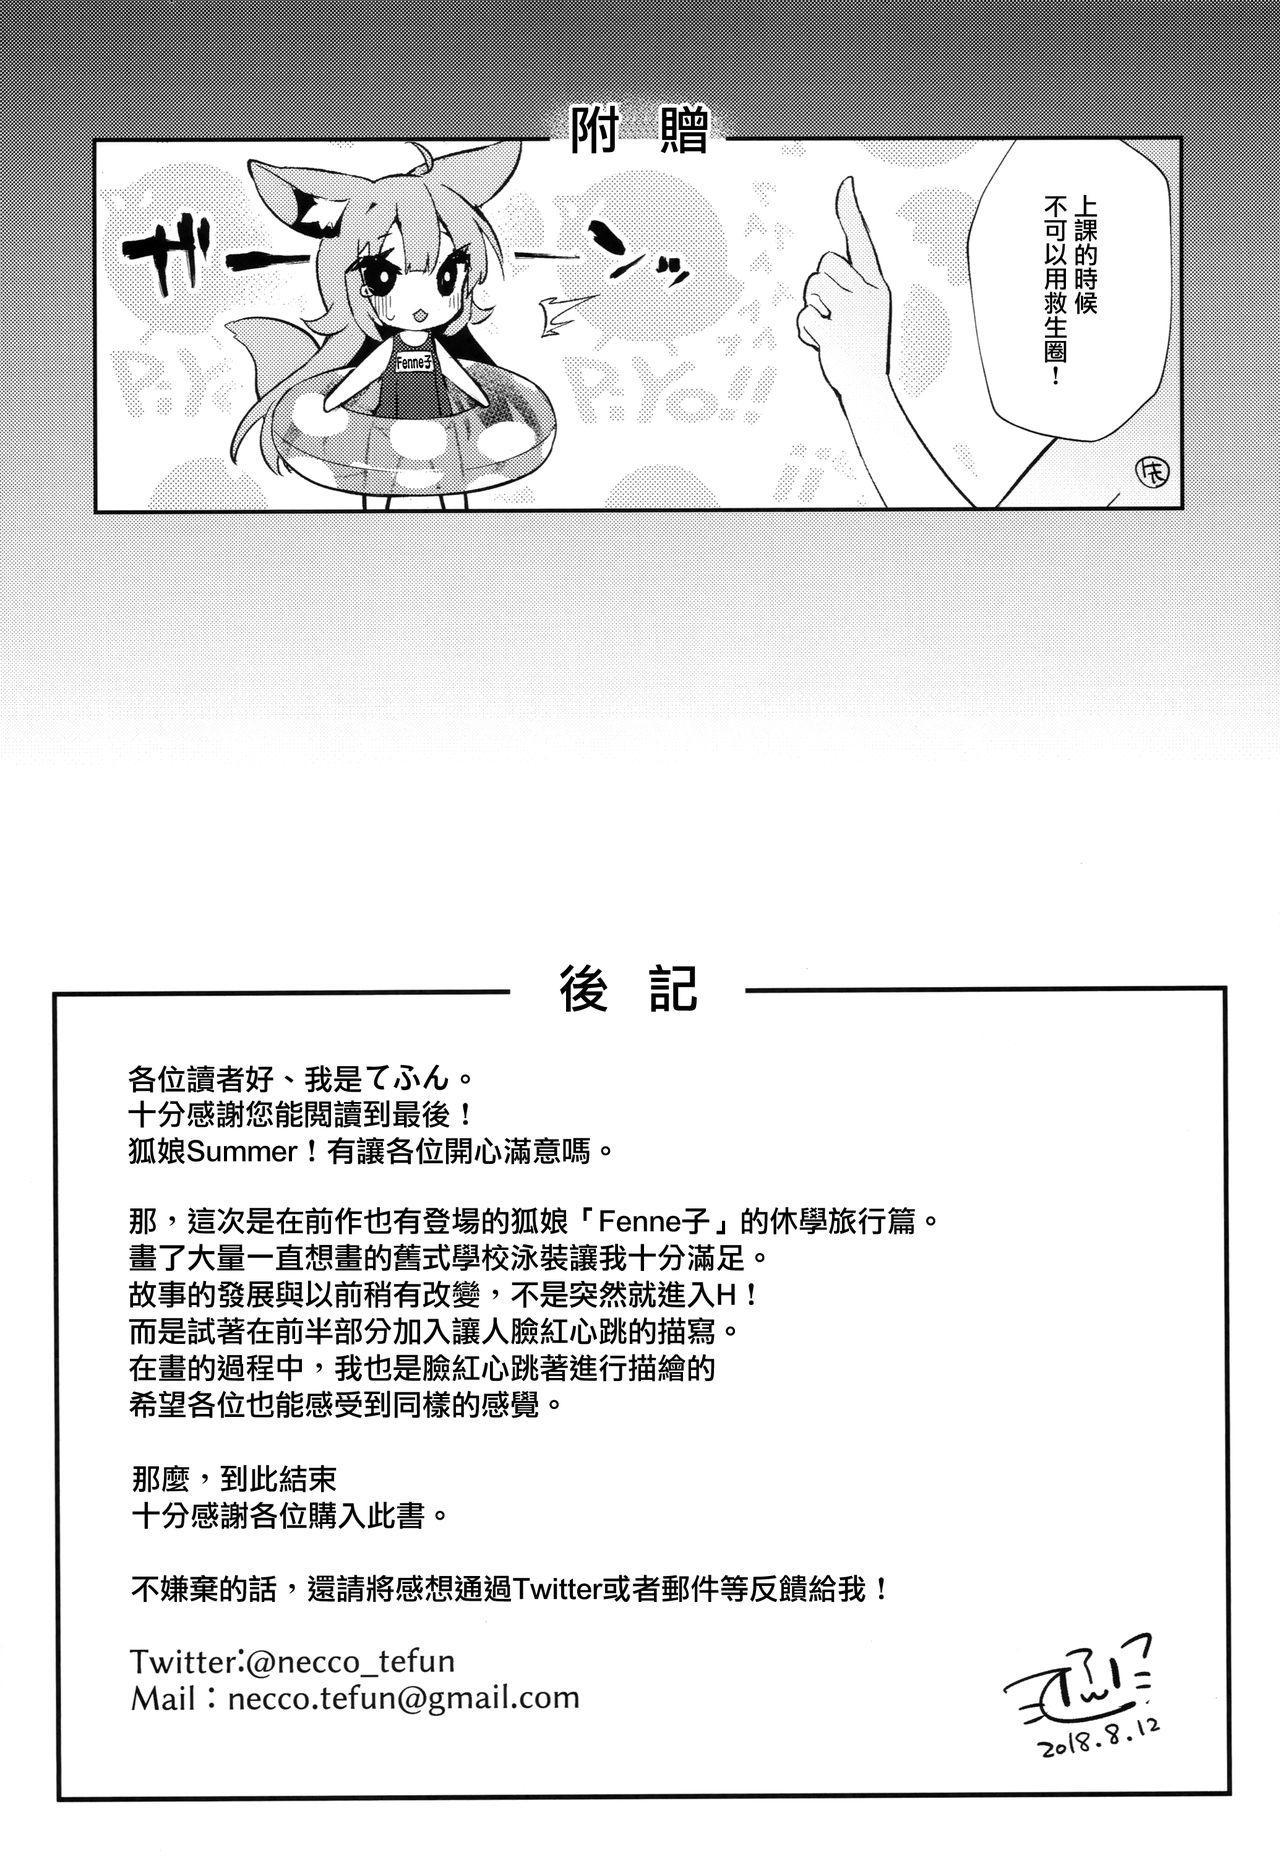 Fennec Musume Summer! 19